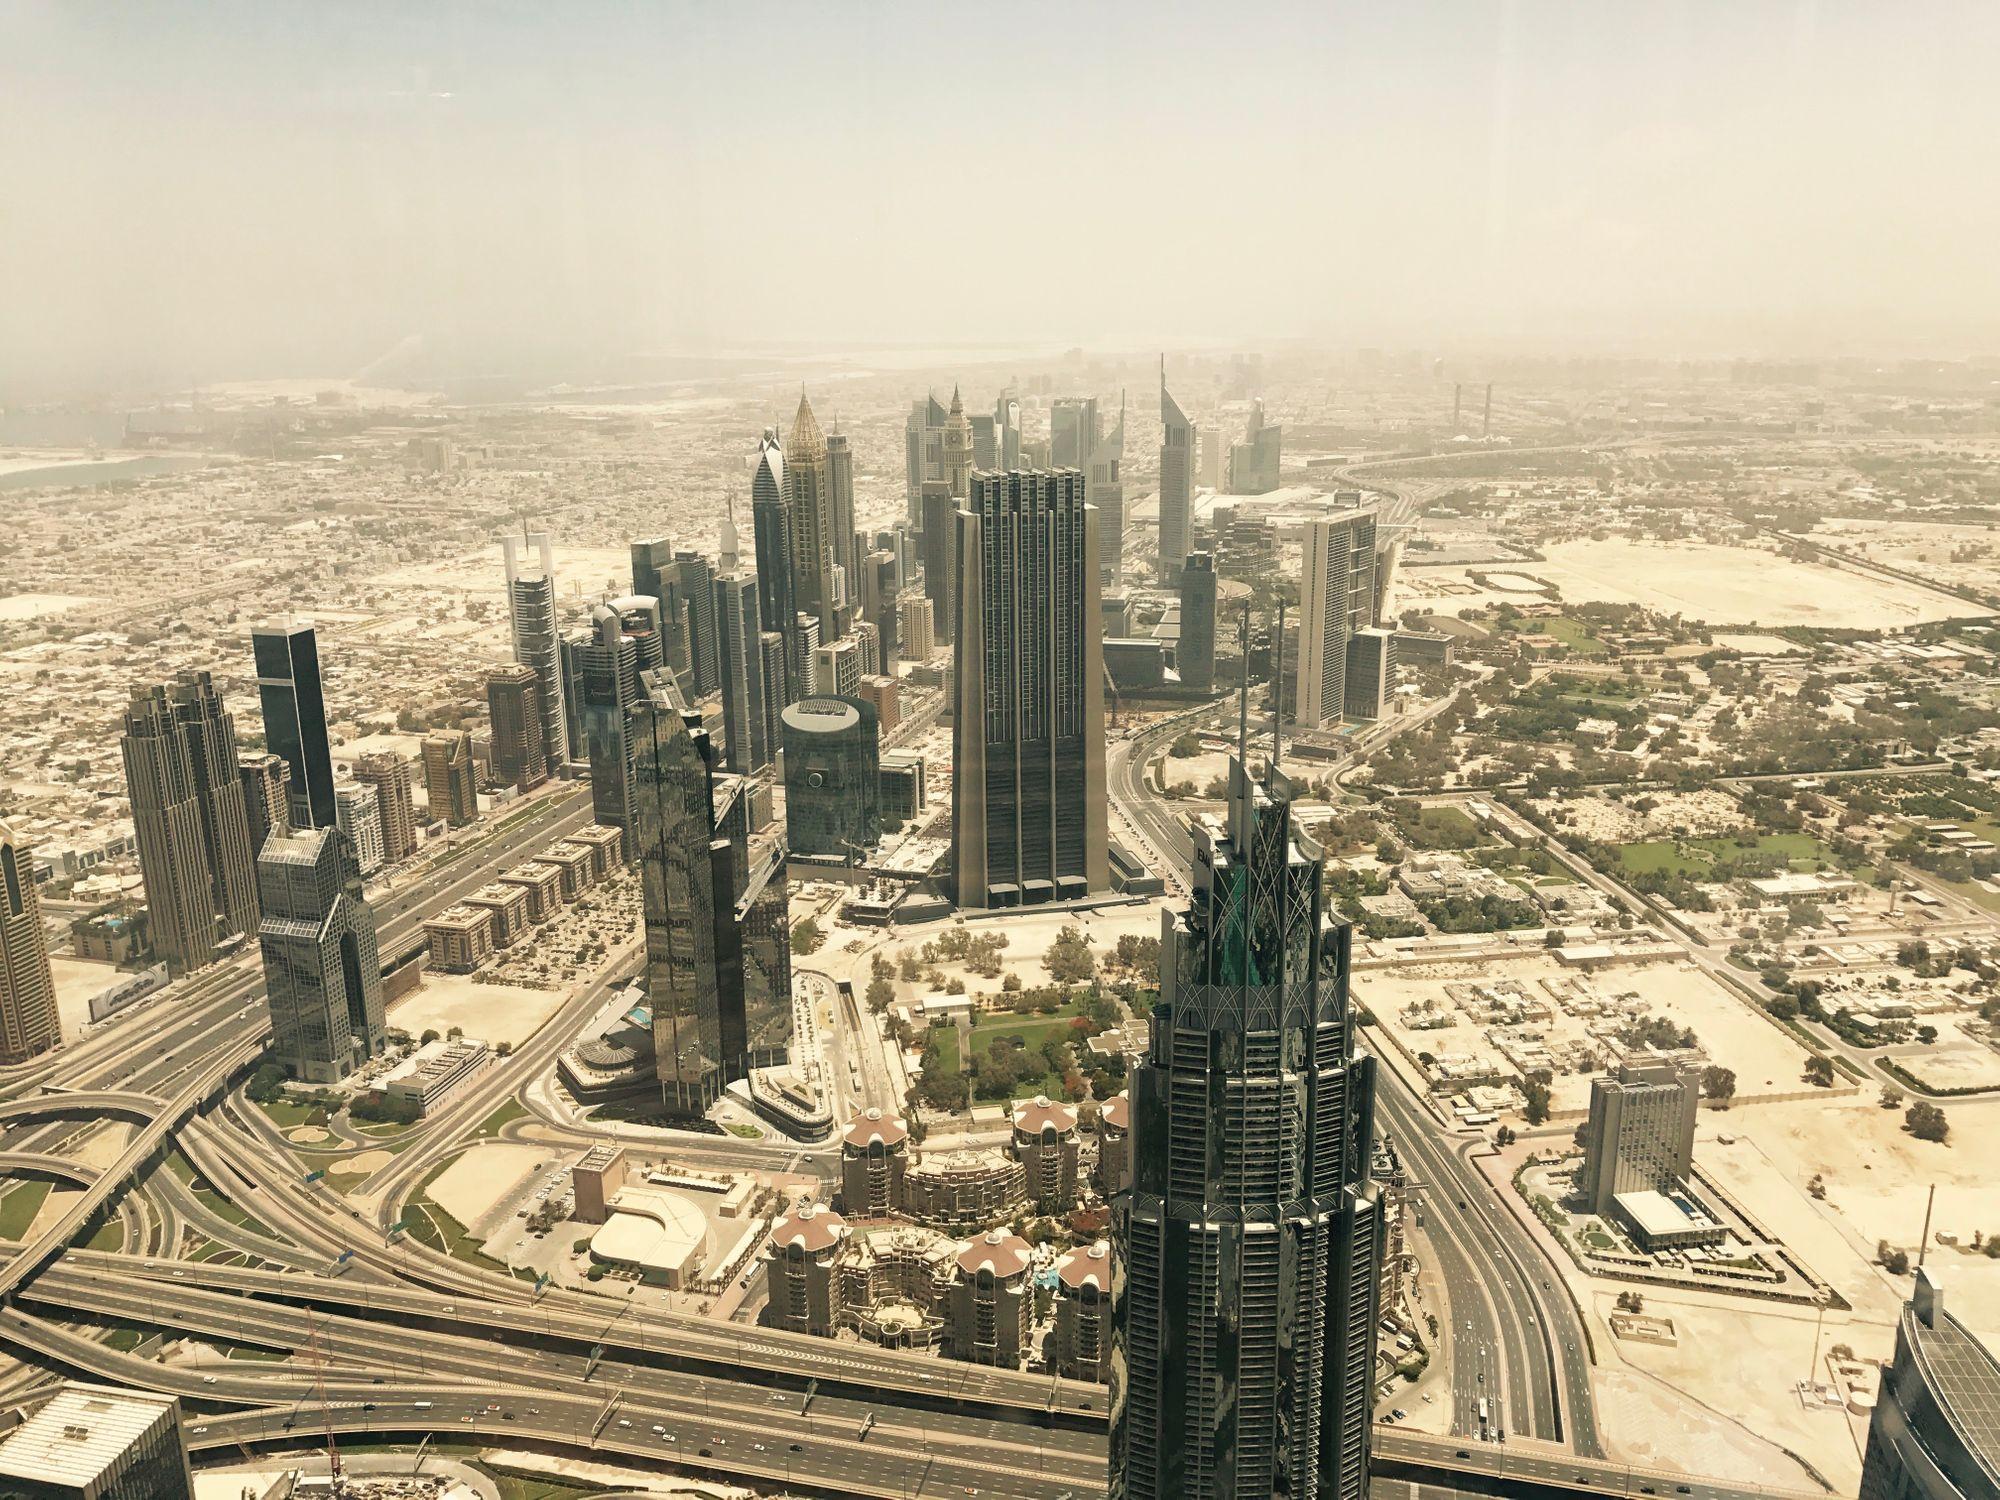 Vista desde el piso 124 del Burj Khalifa